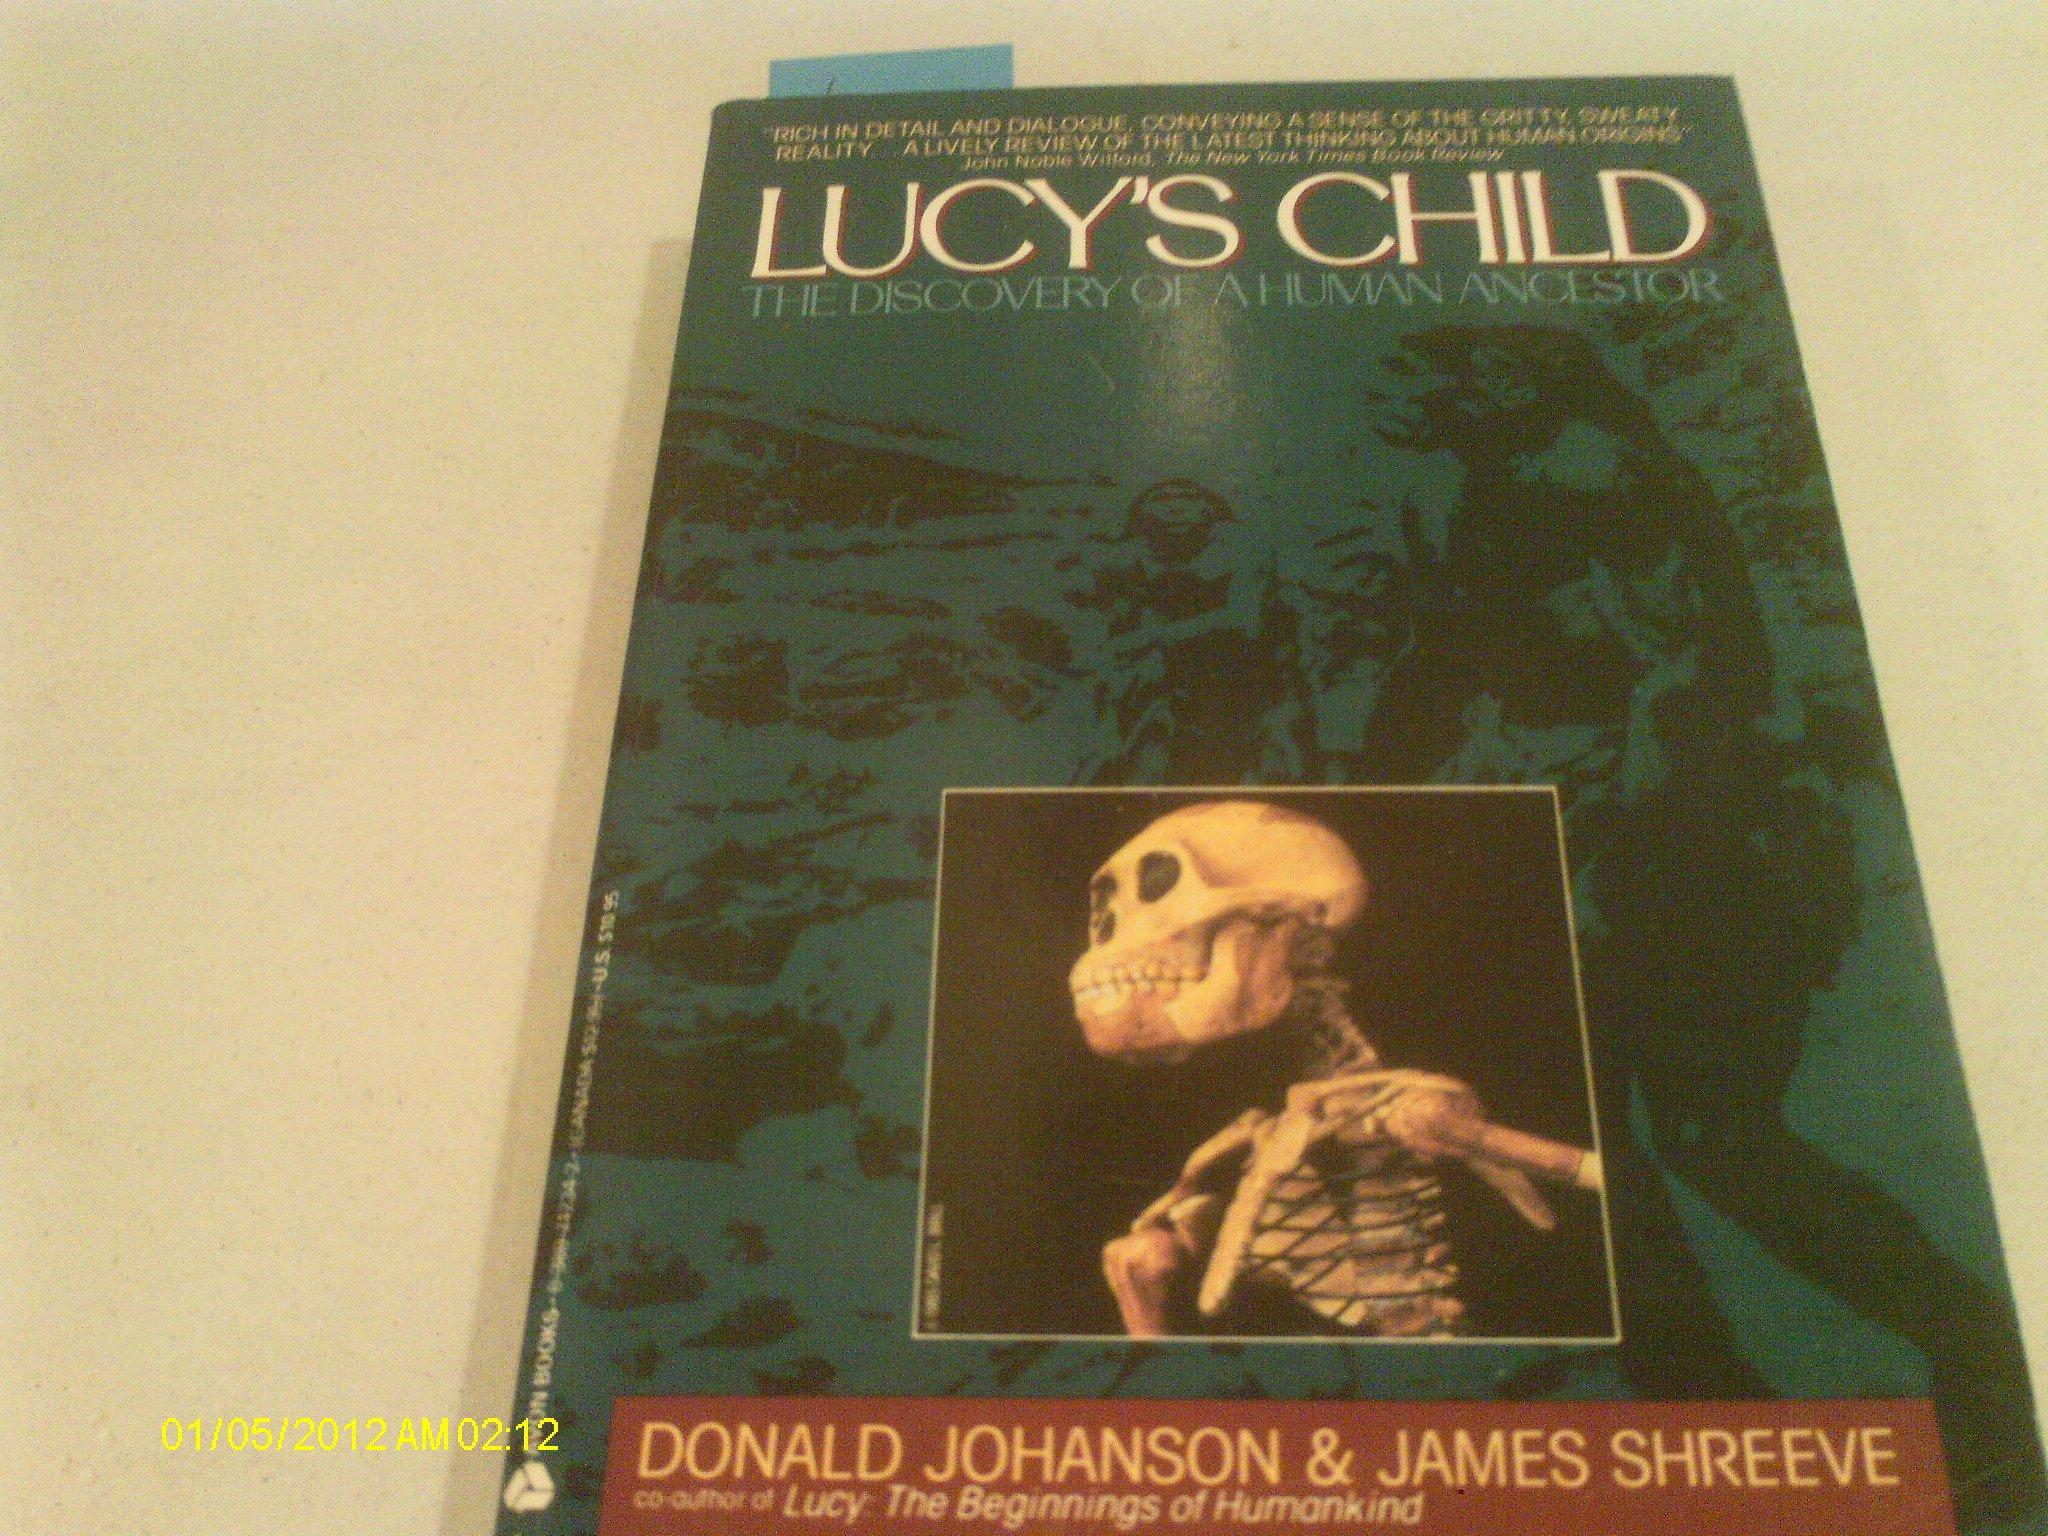 Lucy's Child: The Discovery of a Human Ancestor: Donald Johanson, James  Shreeve: 9780380712342: Amazon.com: Books